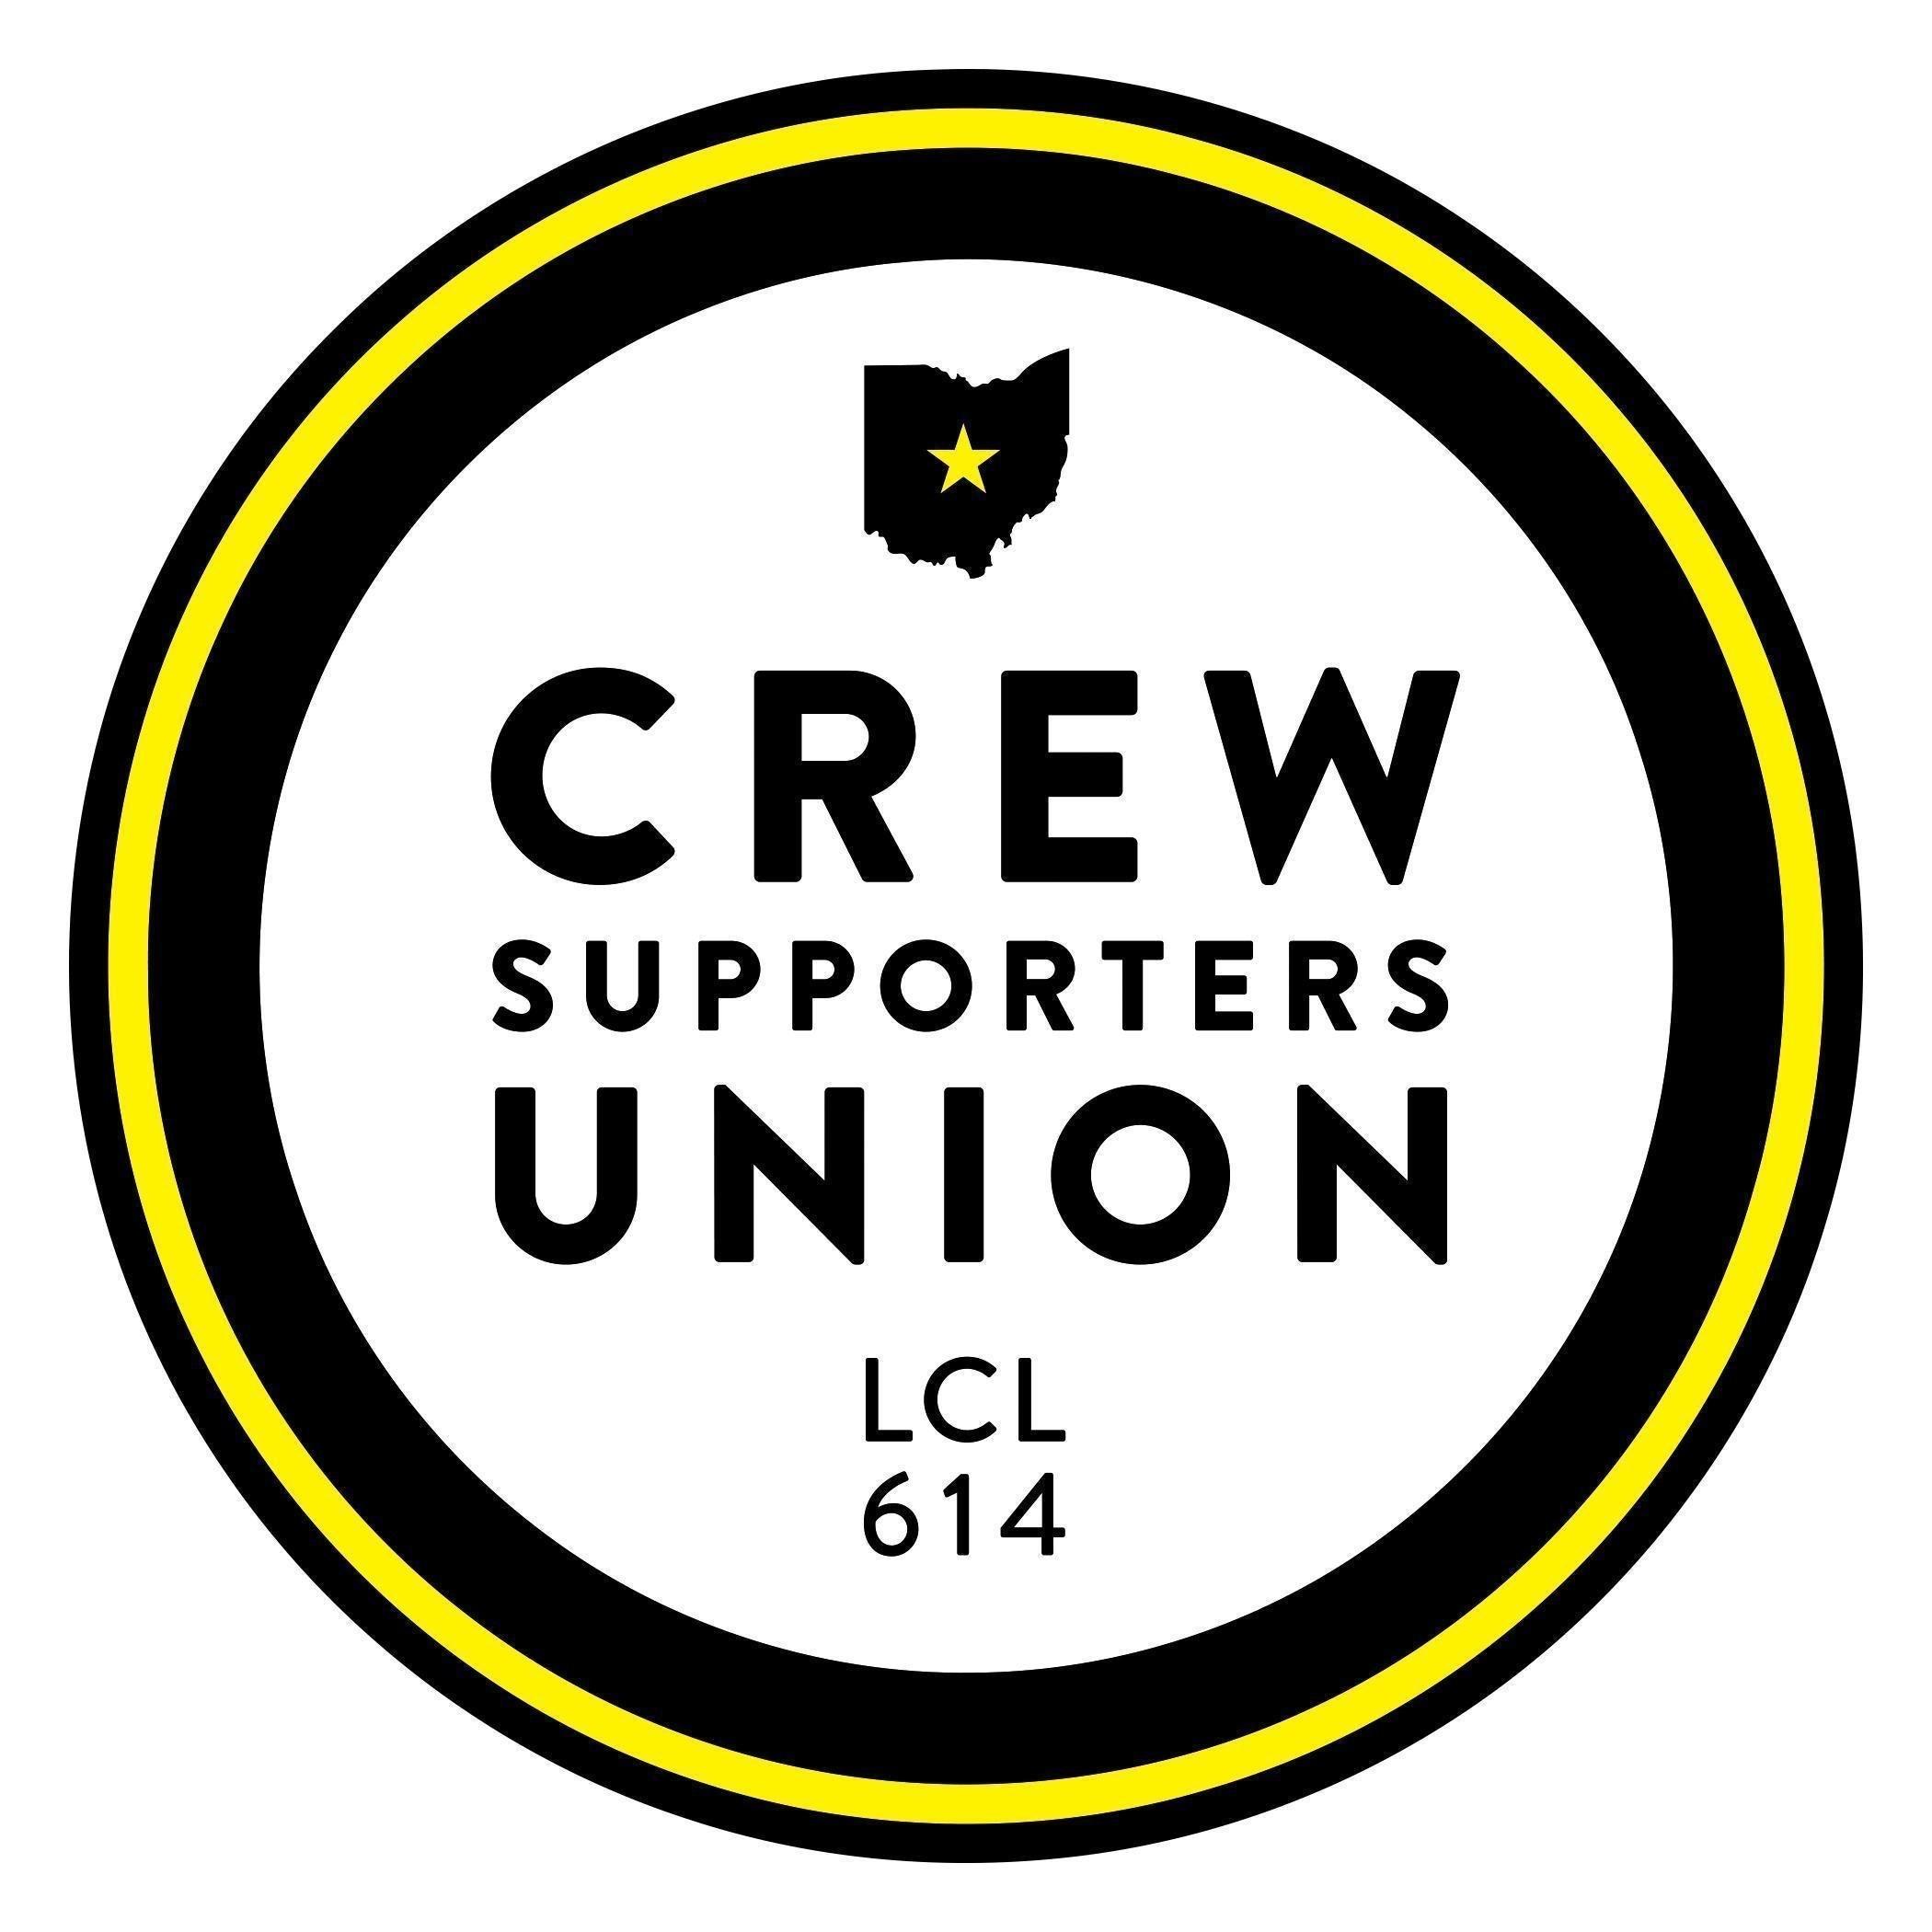 CrewSupportersUnion